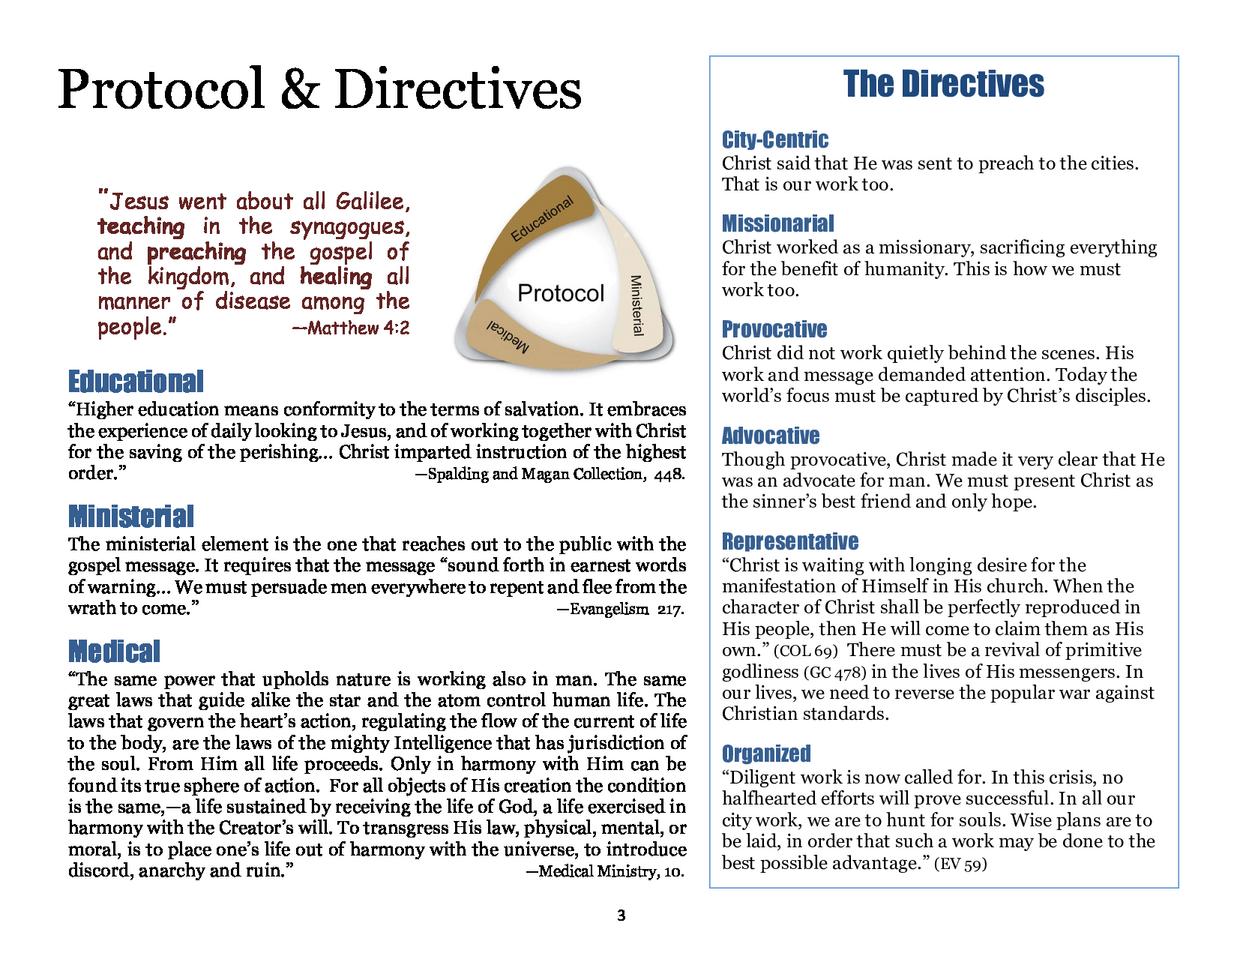 3_protocols_directives